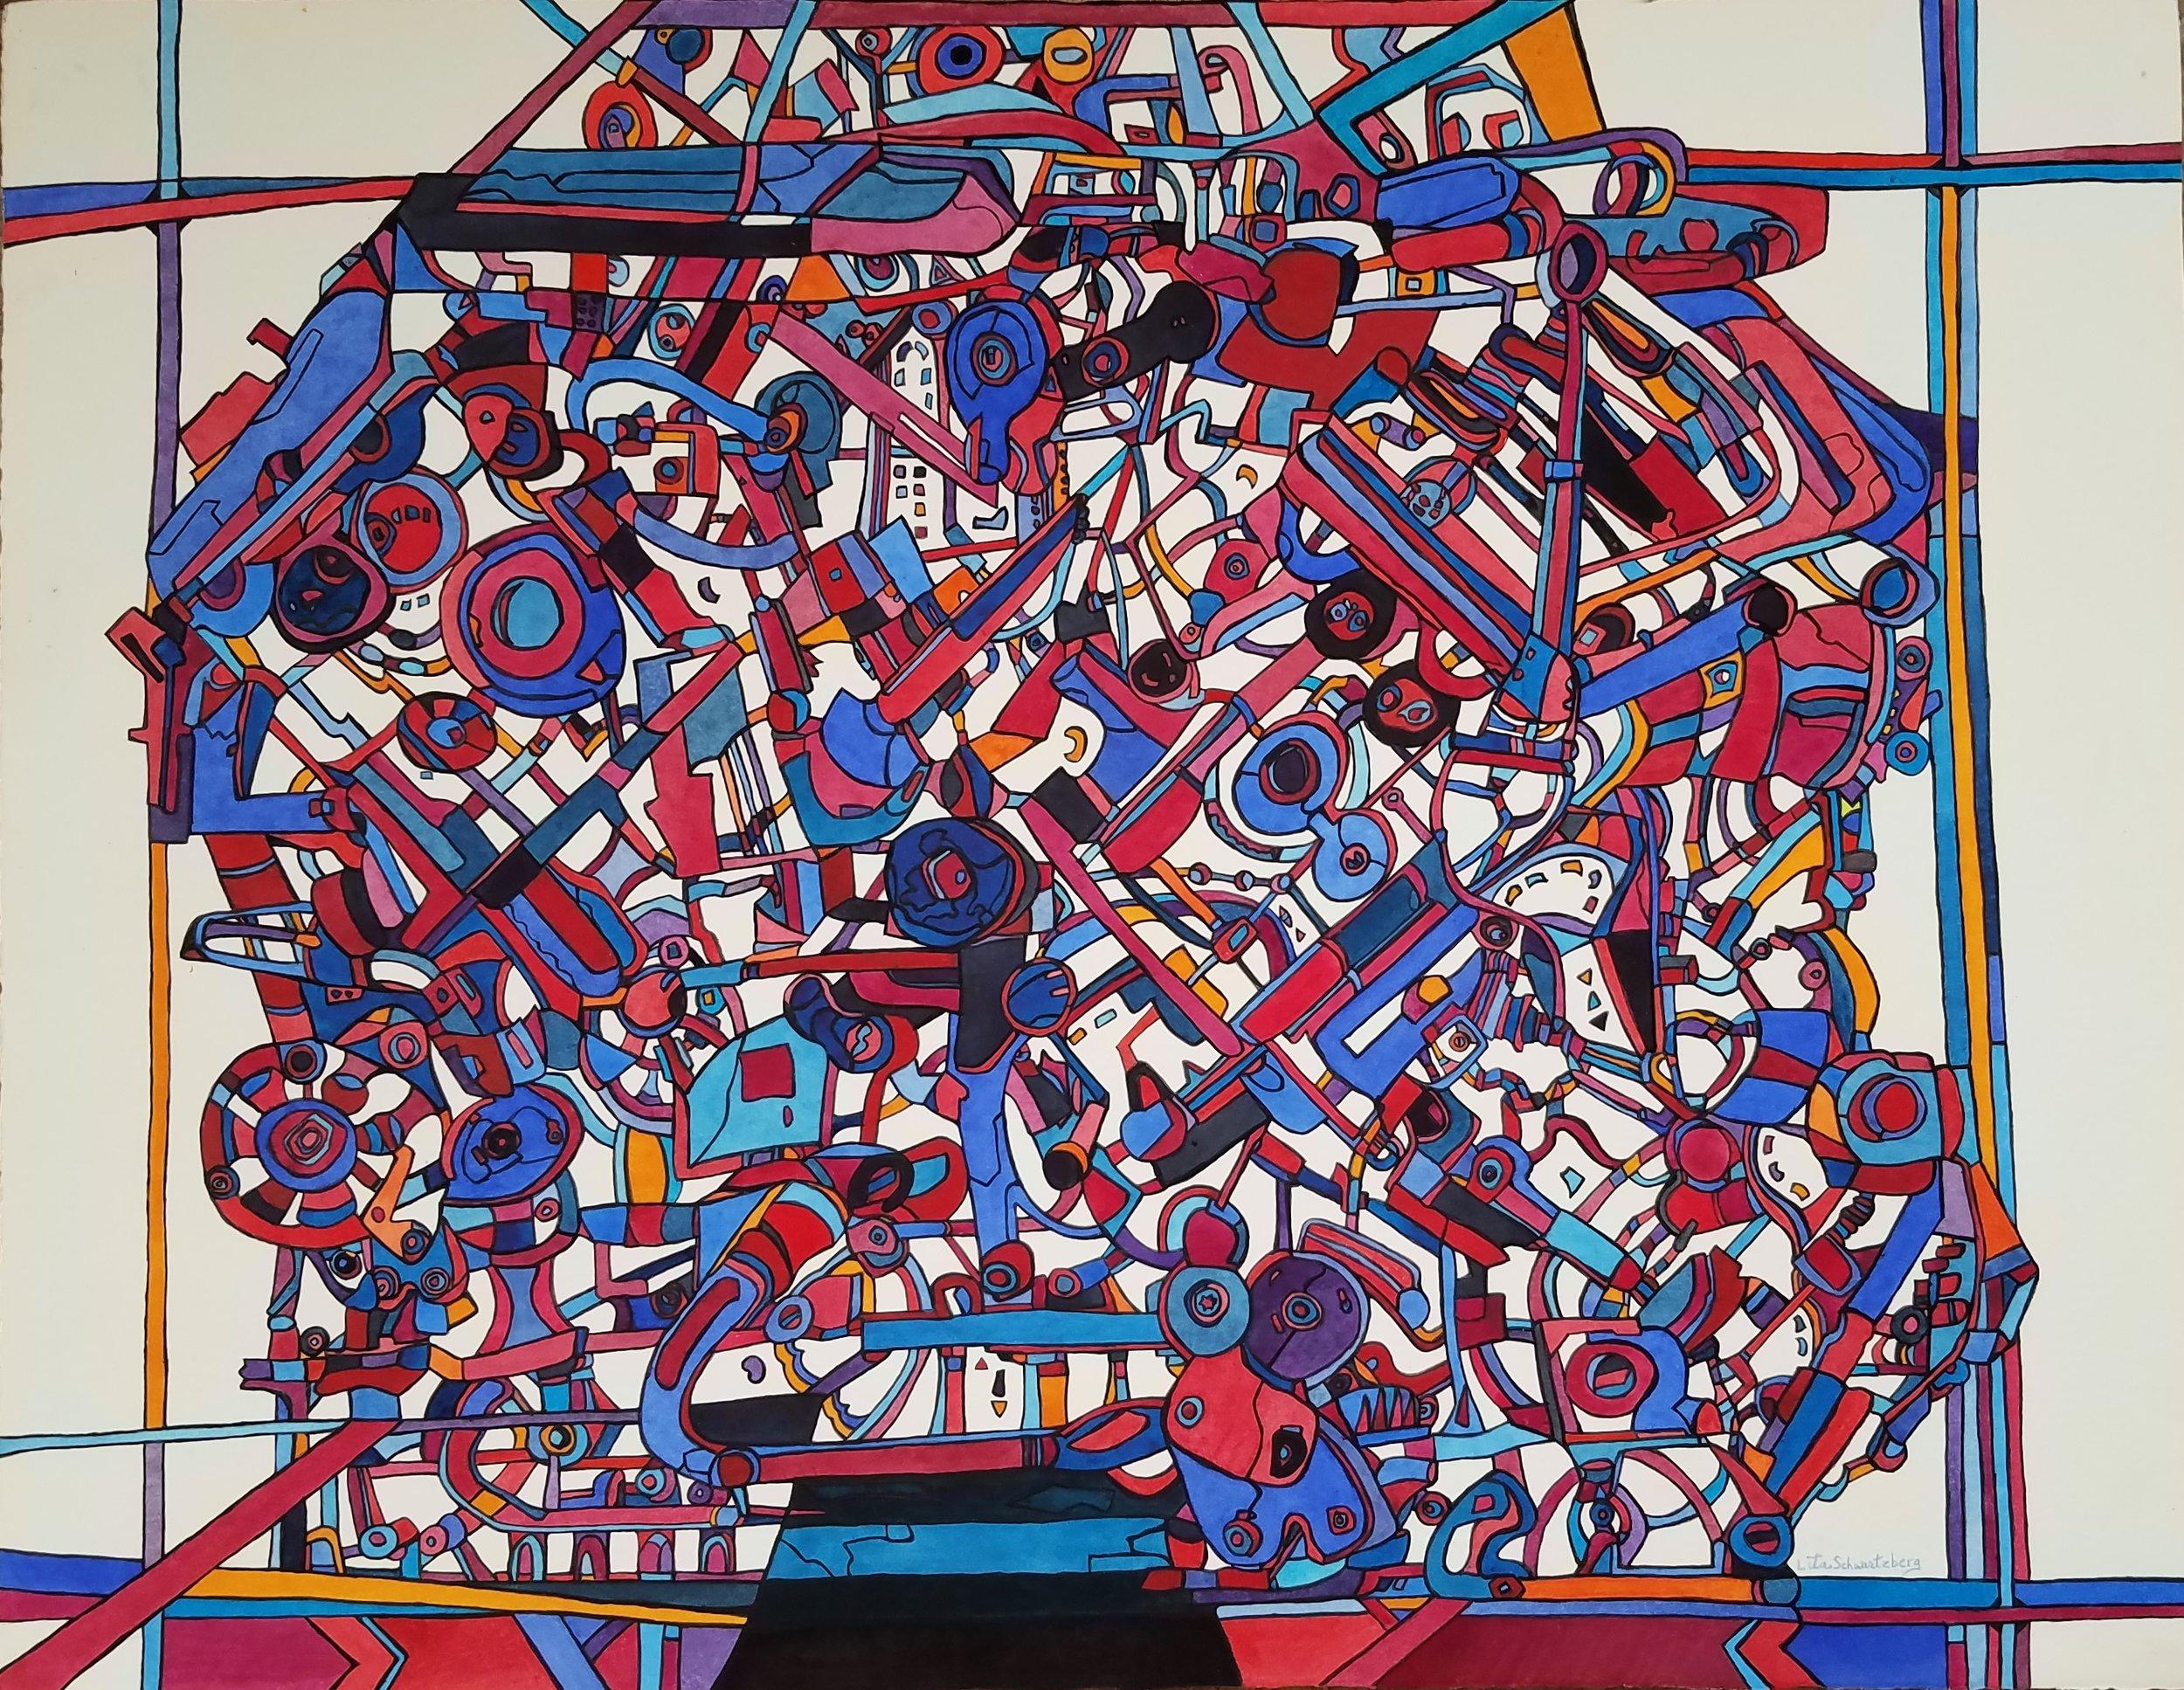 Lita Schwartzberg Title: Modern Times Size: 22 x 28 Price: $2500